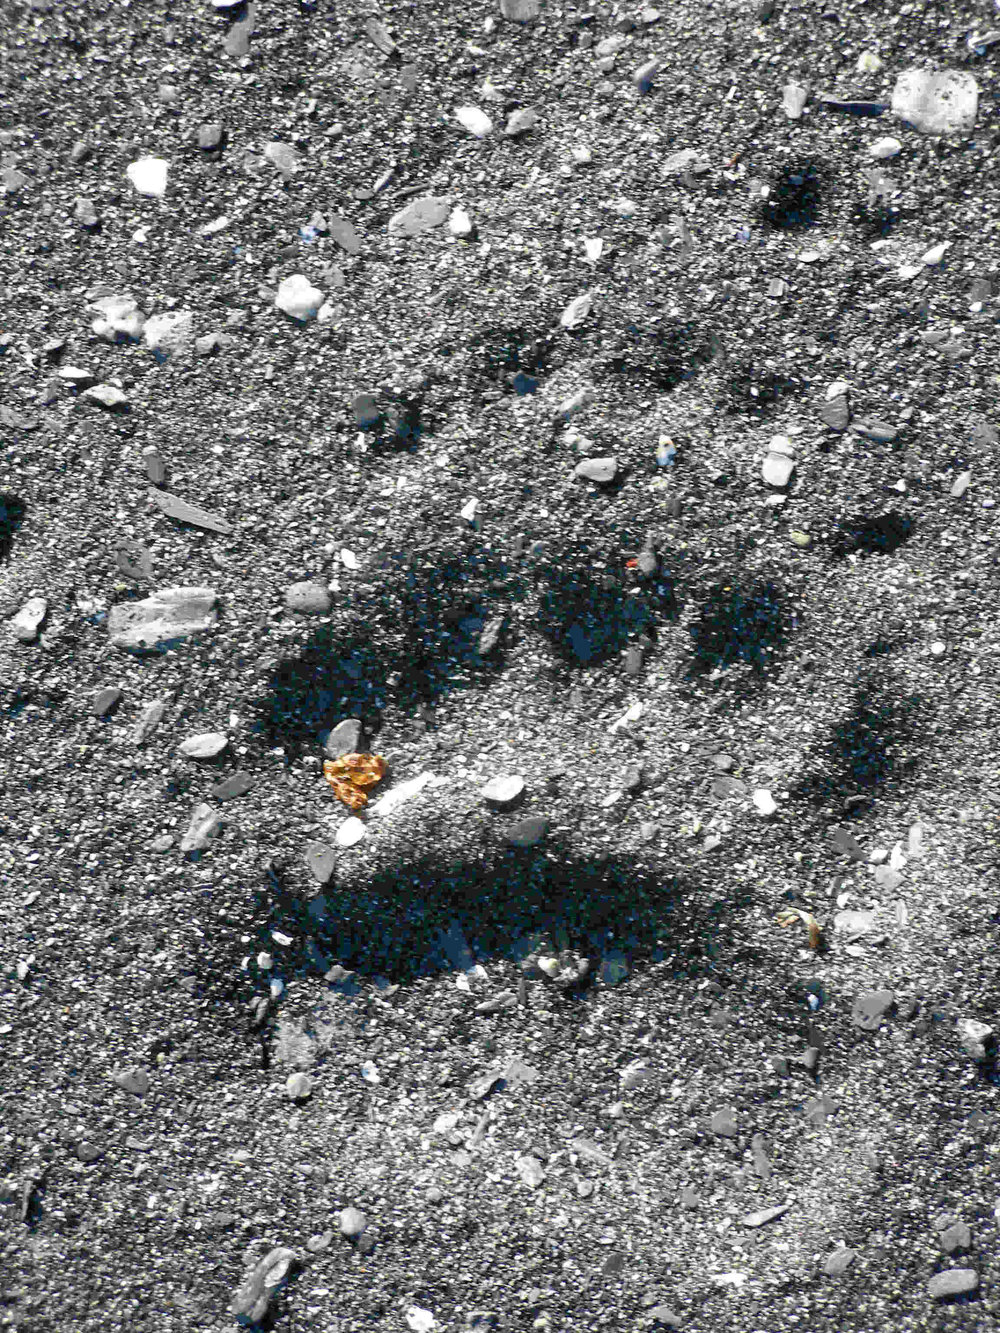 Kodiak brown bear foot print